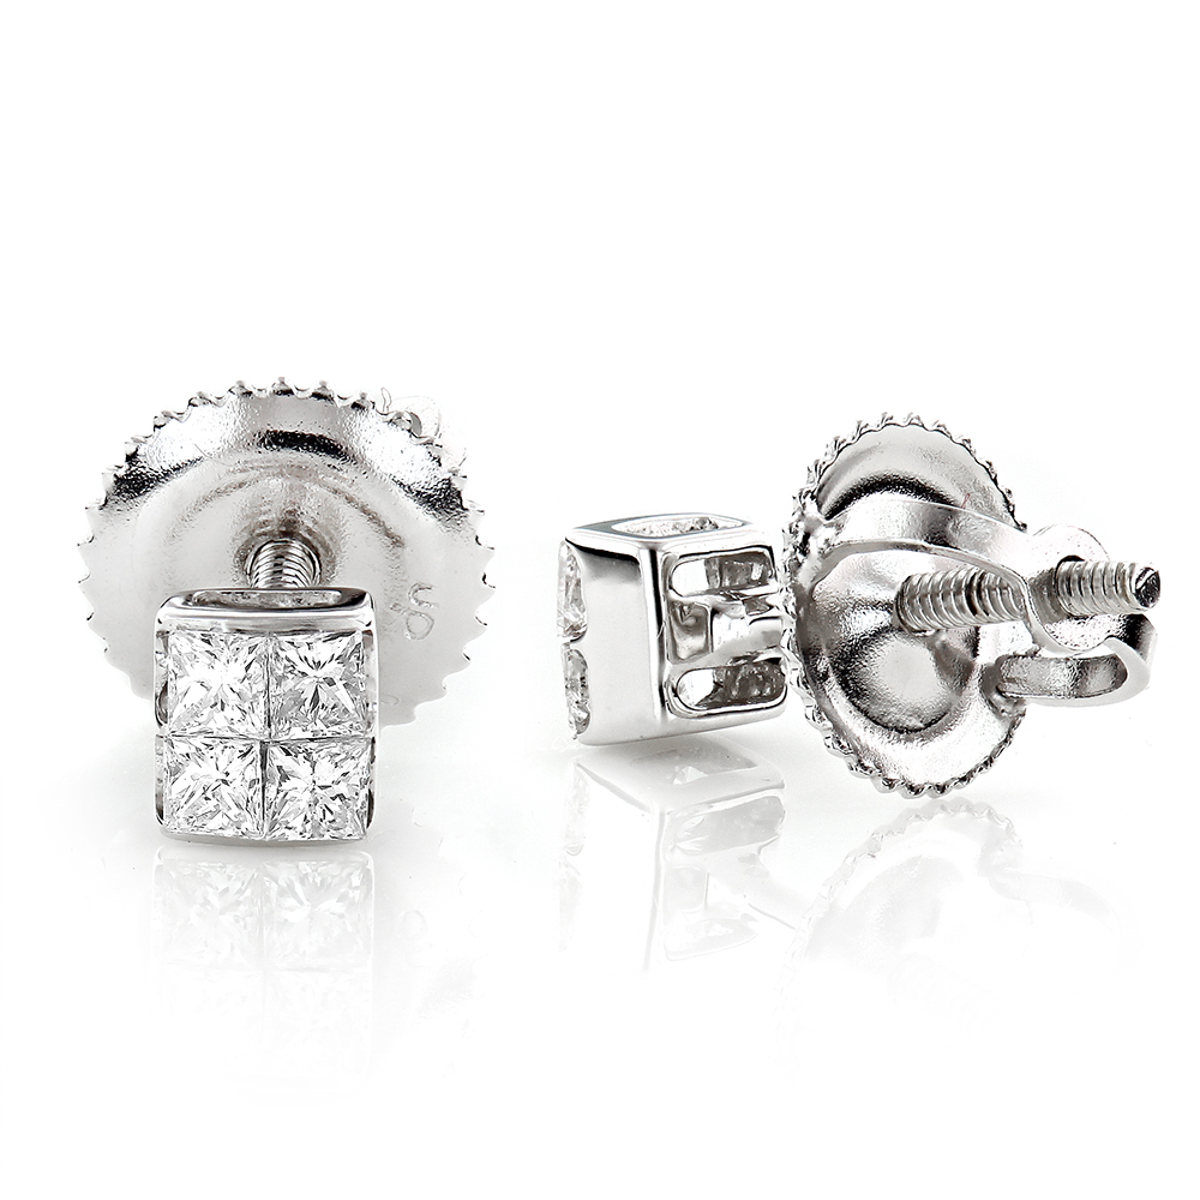 Small Princess Cut Diamond Earrings Studs 0.3ct 14K Gold